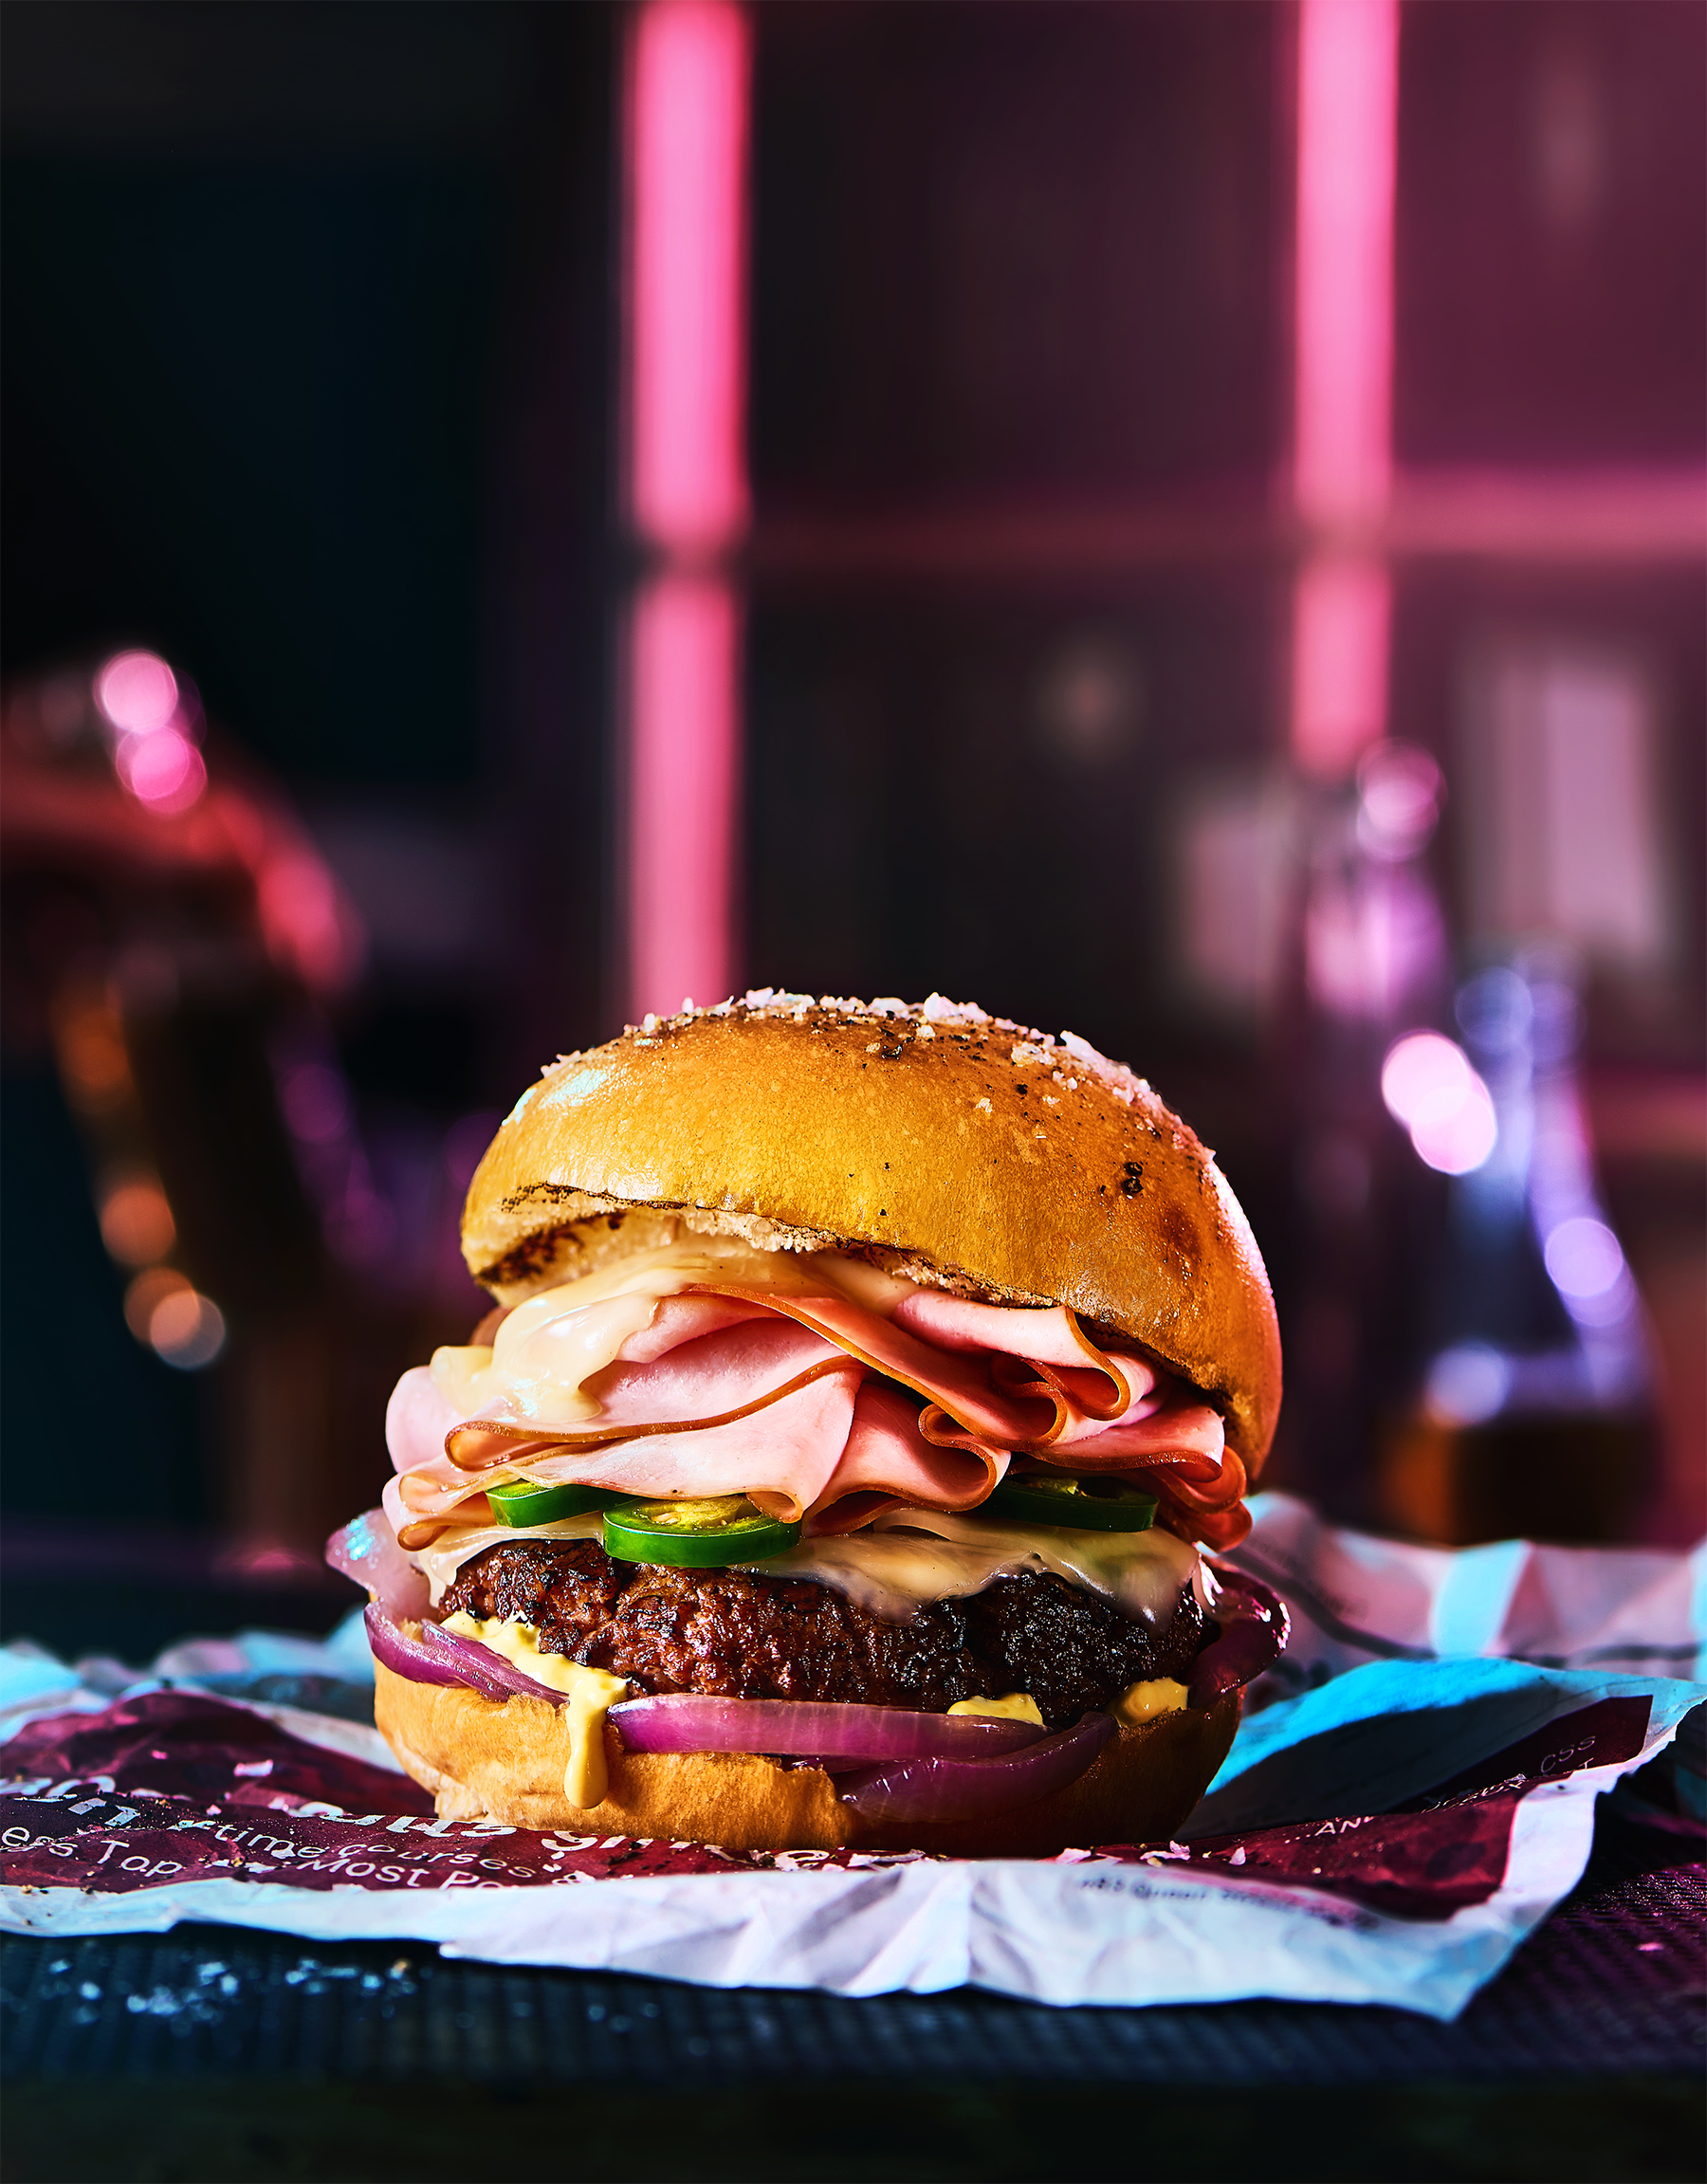 nightlife burger